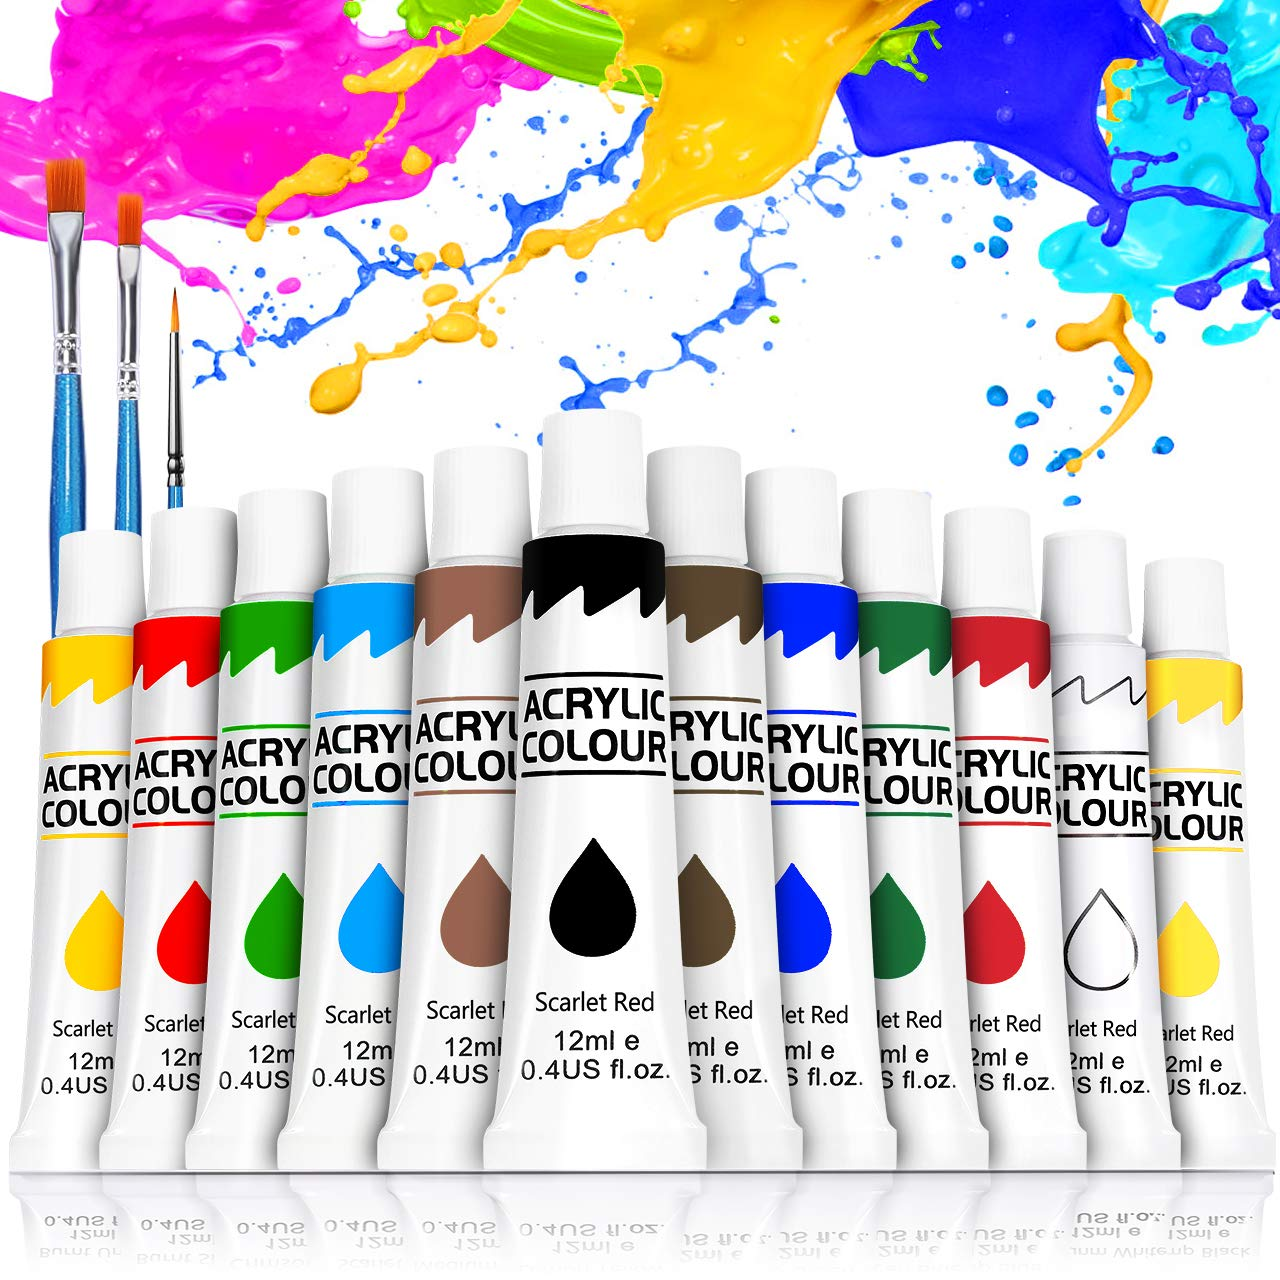 Farby akrylowe, Buluri zestaw farb akrylowych 12 x 12 ml